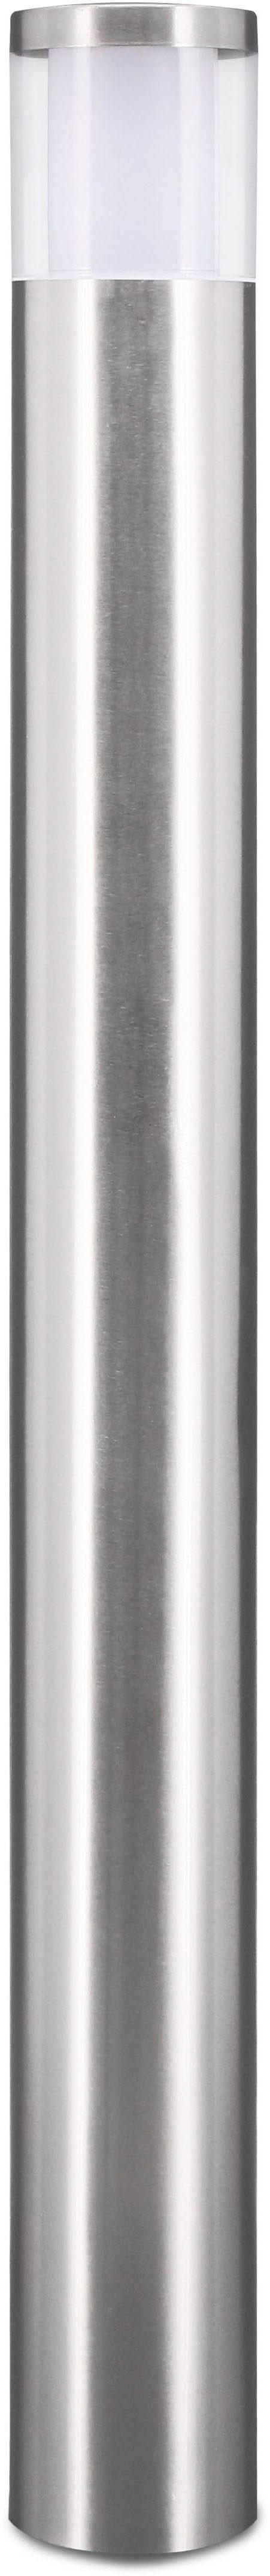 EGLO LED Stehlampe »Basalgo«, 1-flammig